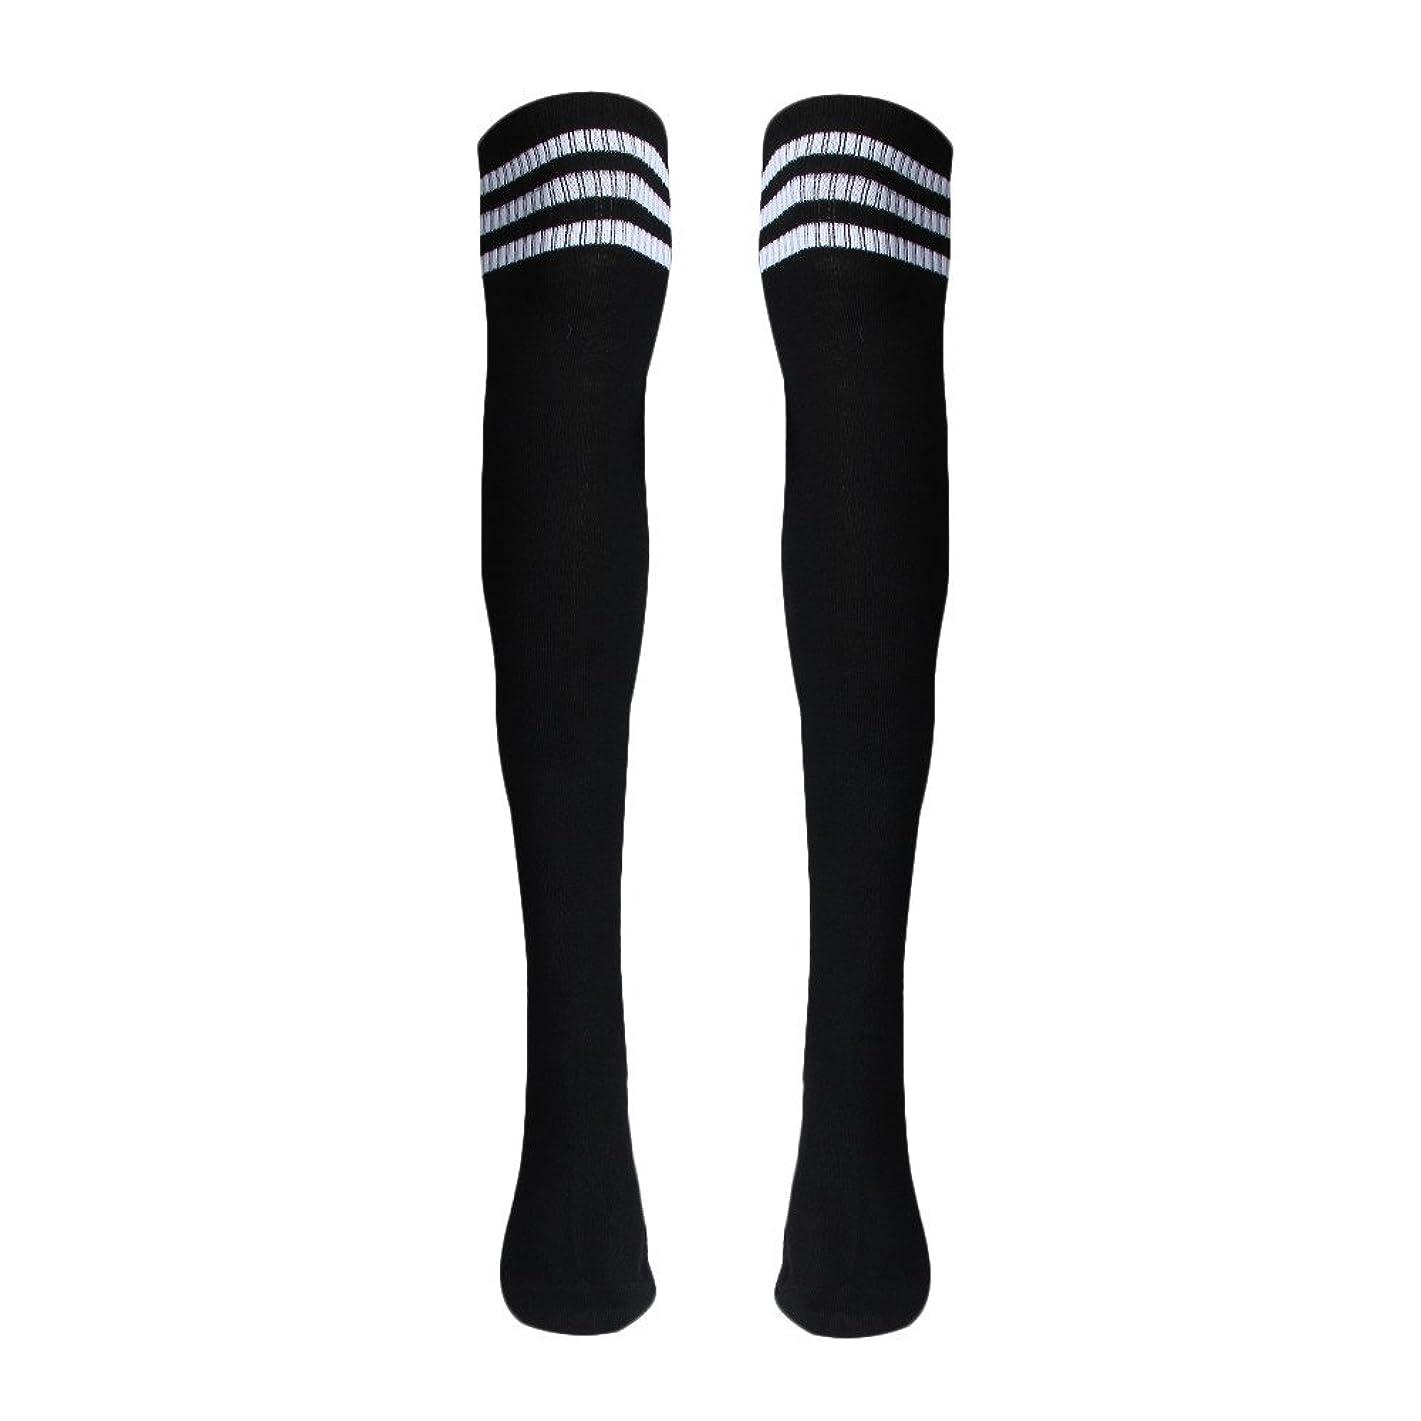 Women Christmas Warm Thigh High Long Stockings Knit Over Knee Socks Xmas